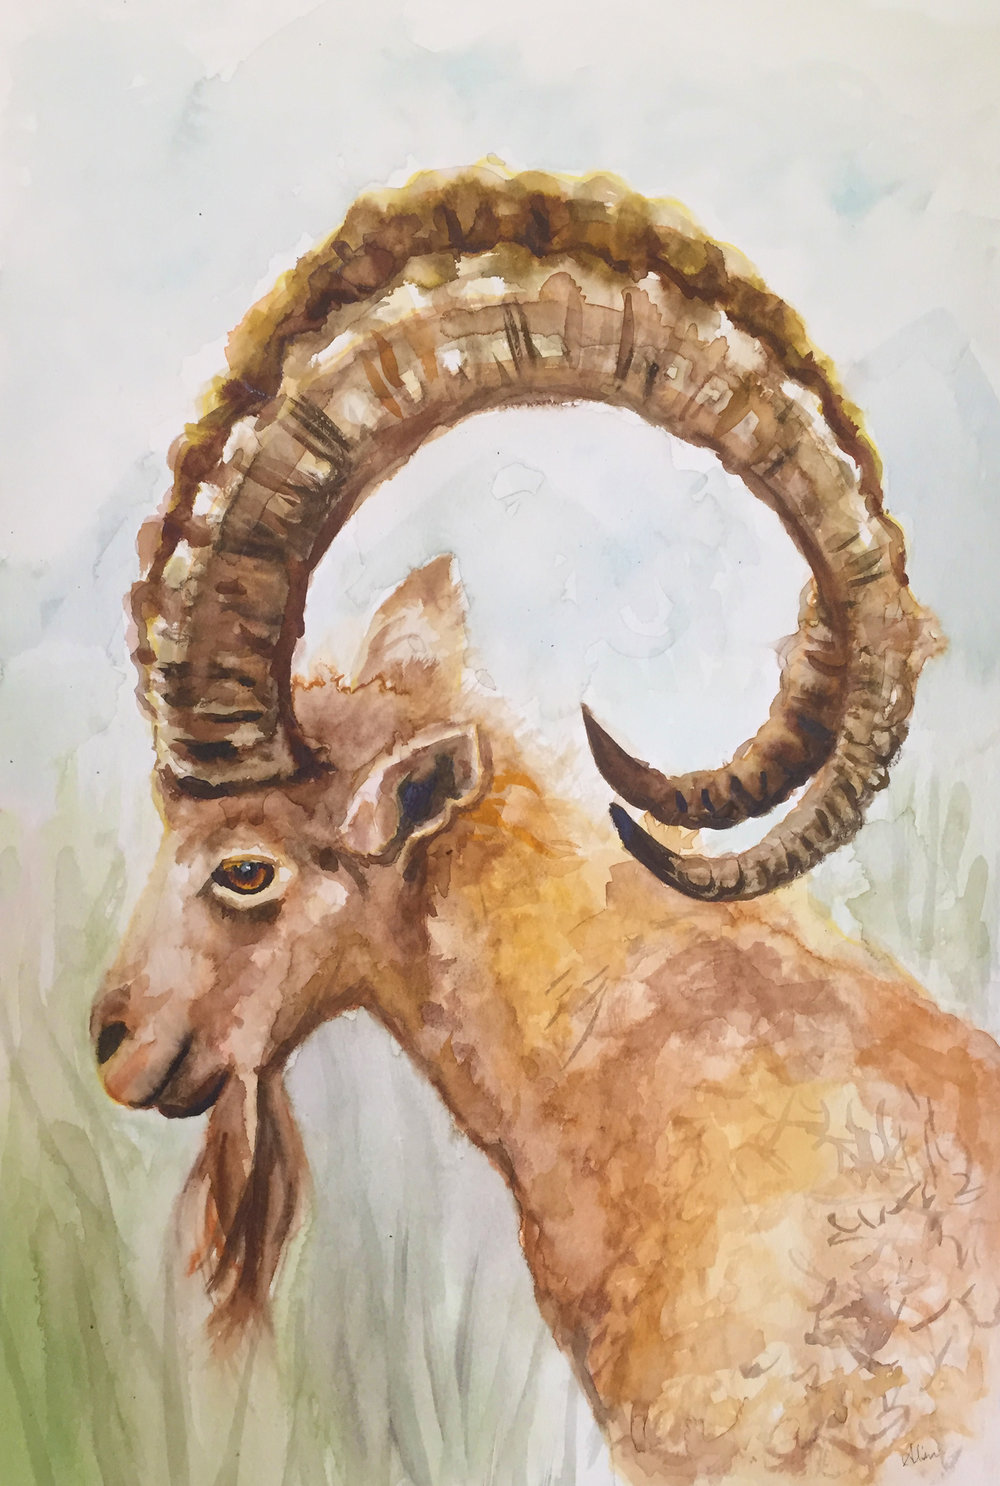 GOAT (Nubian Ibex)